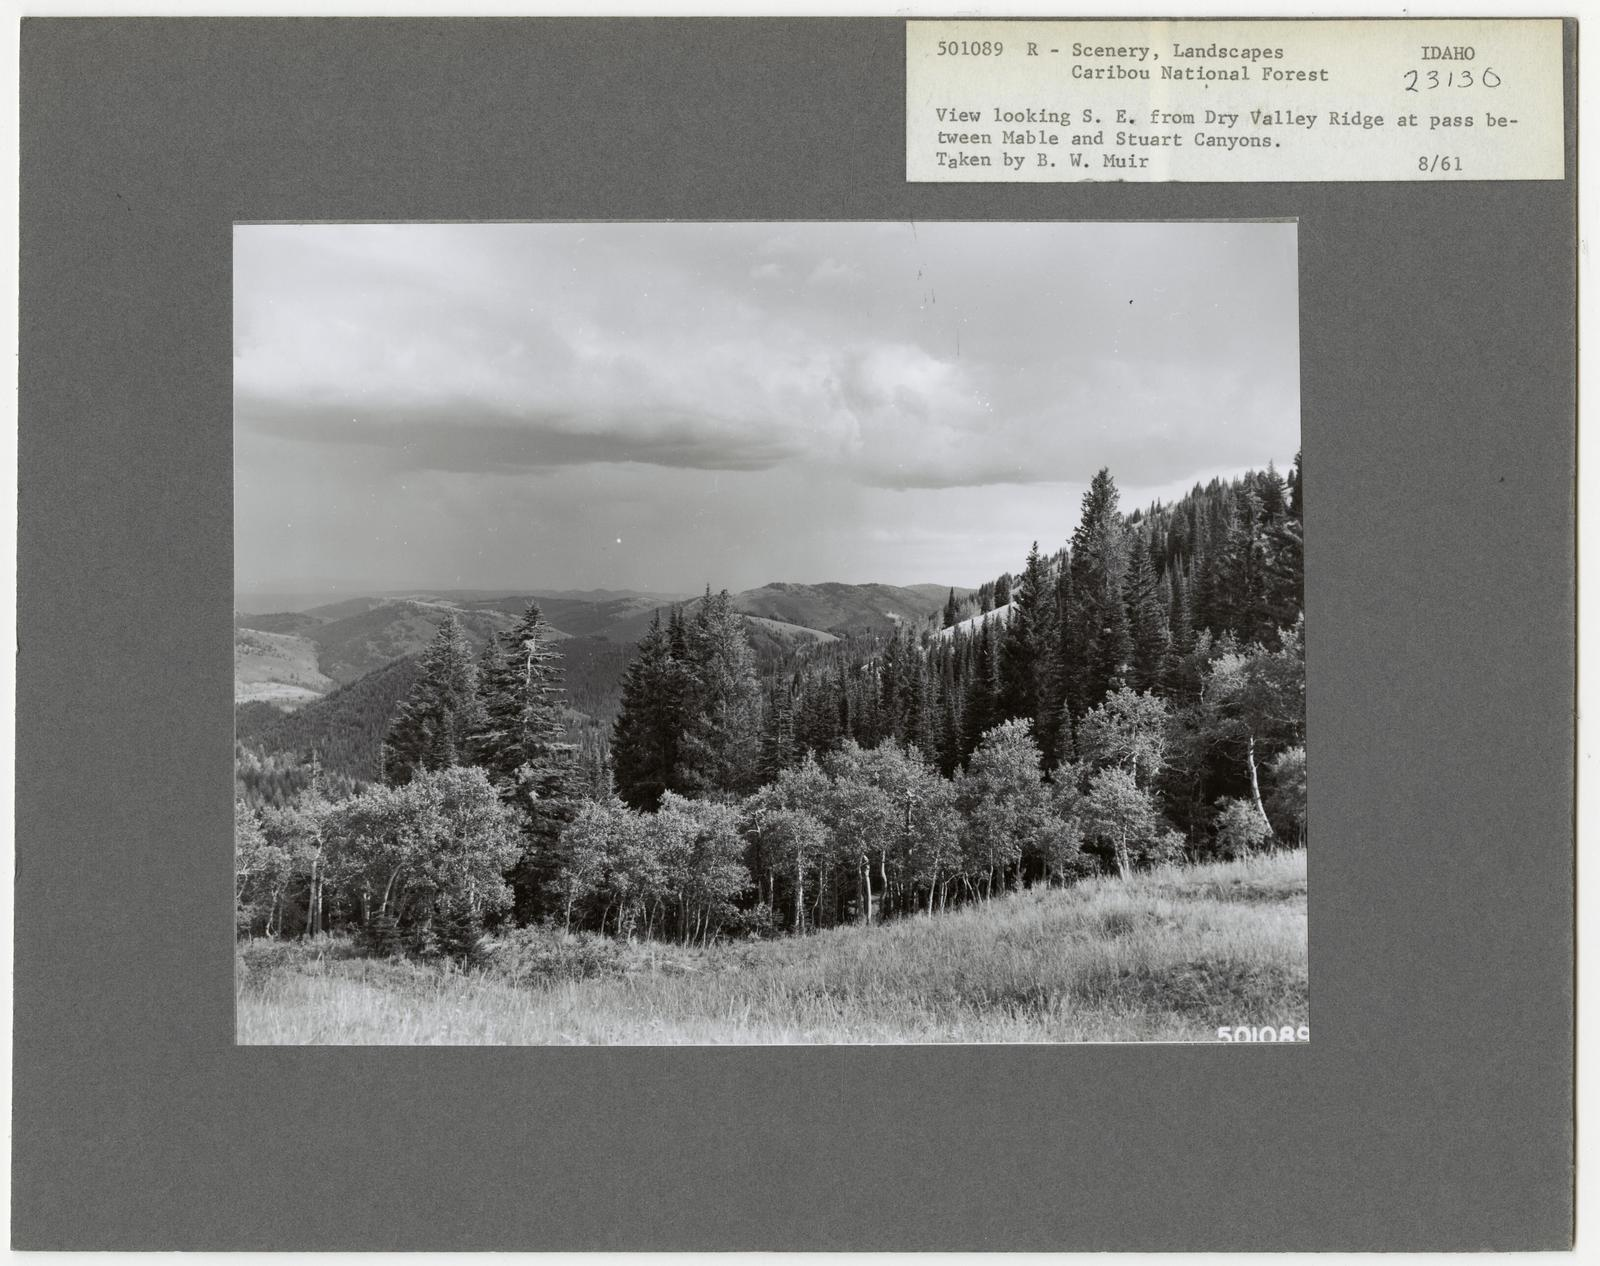 Scenery and Landscapes - Idaho